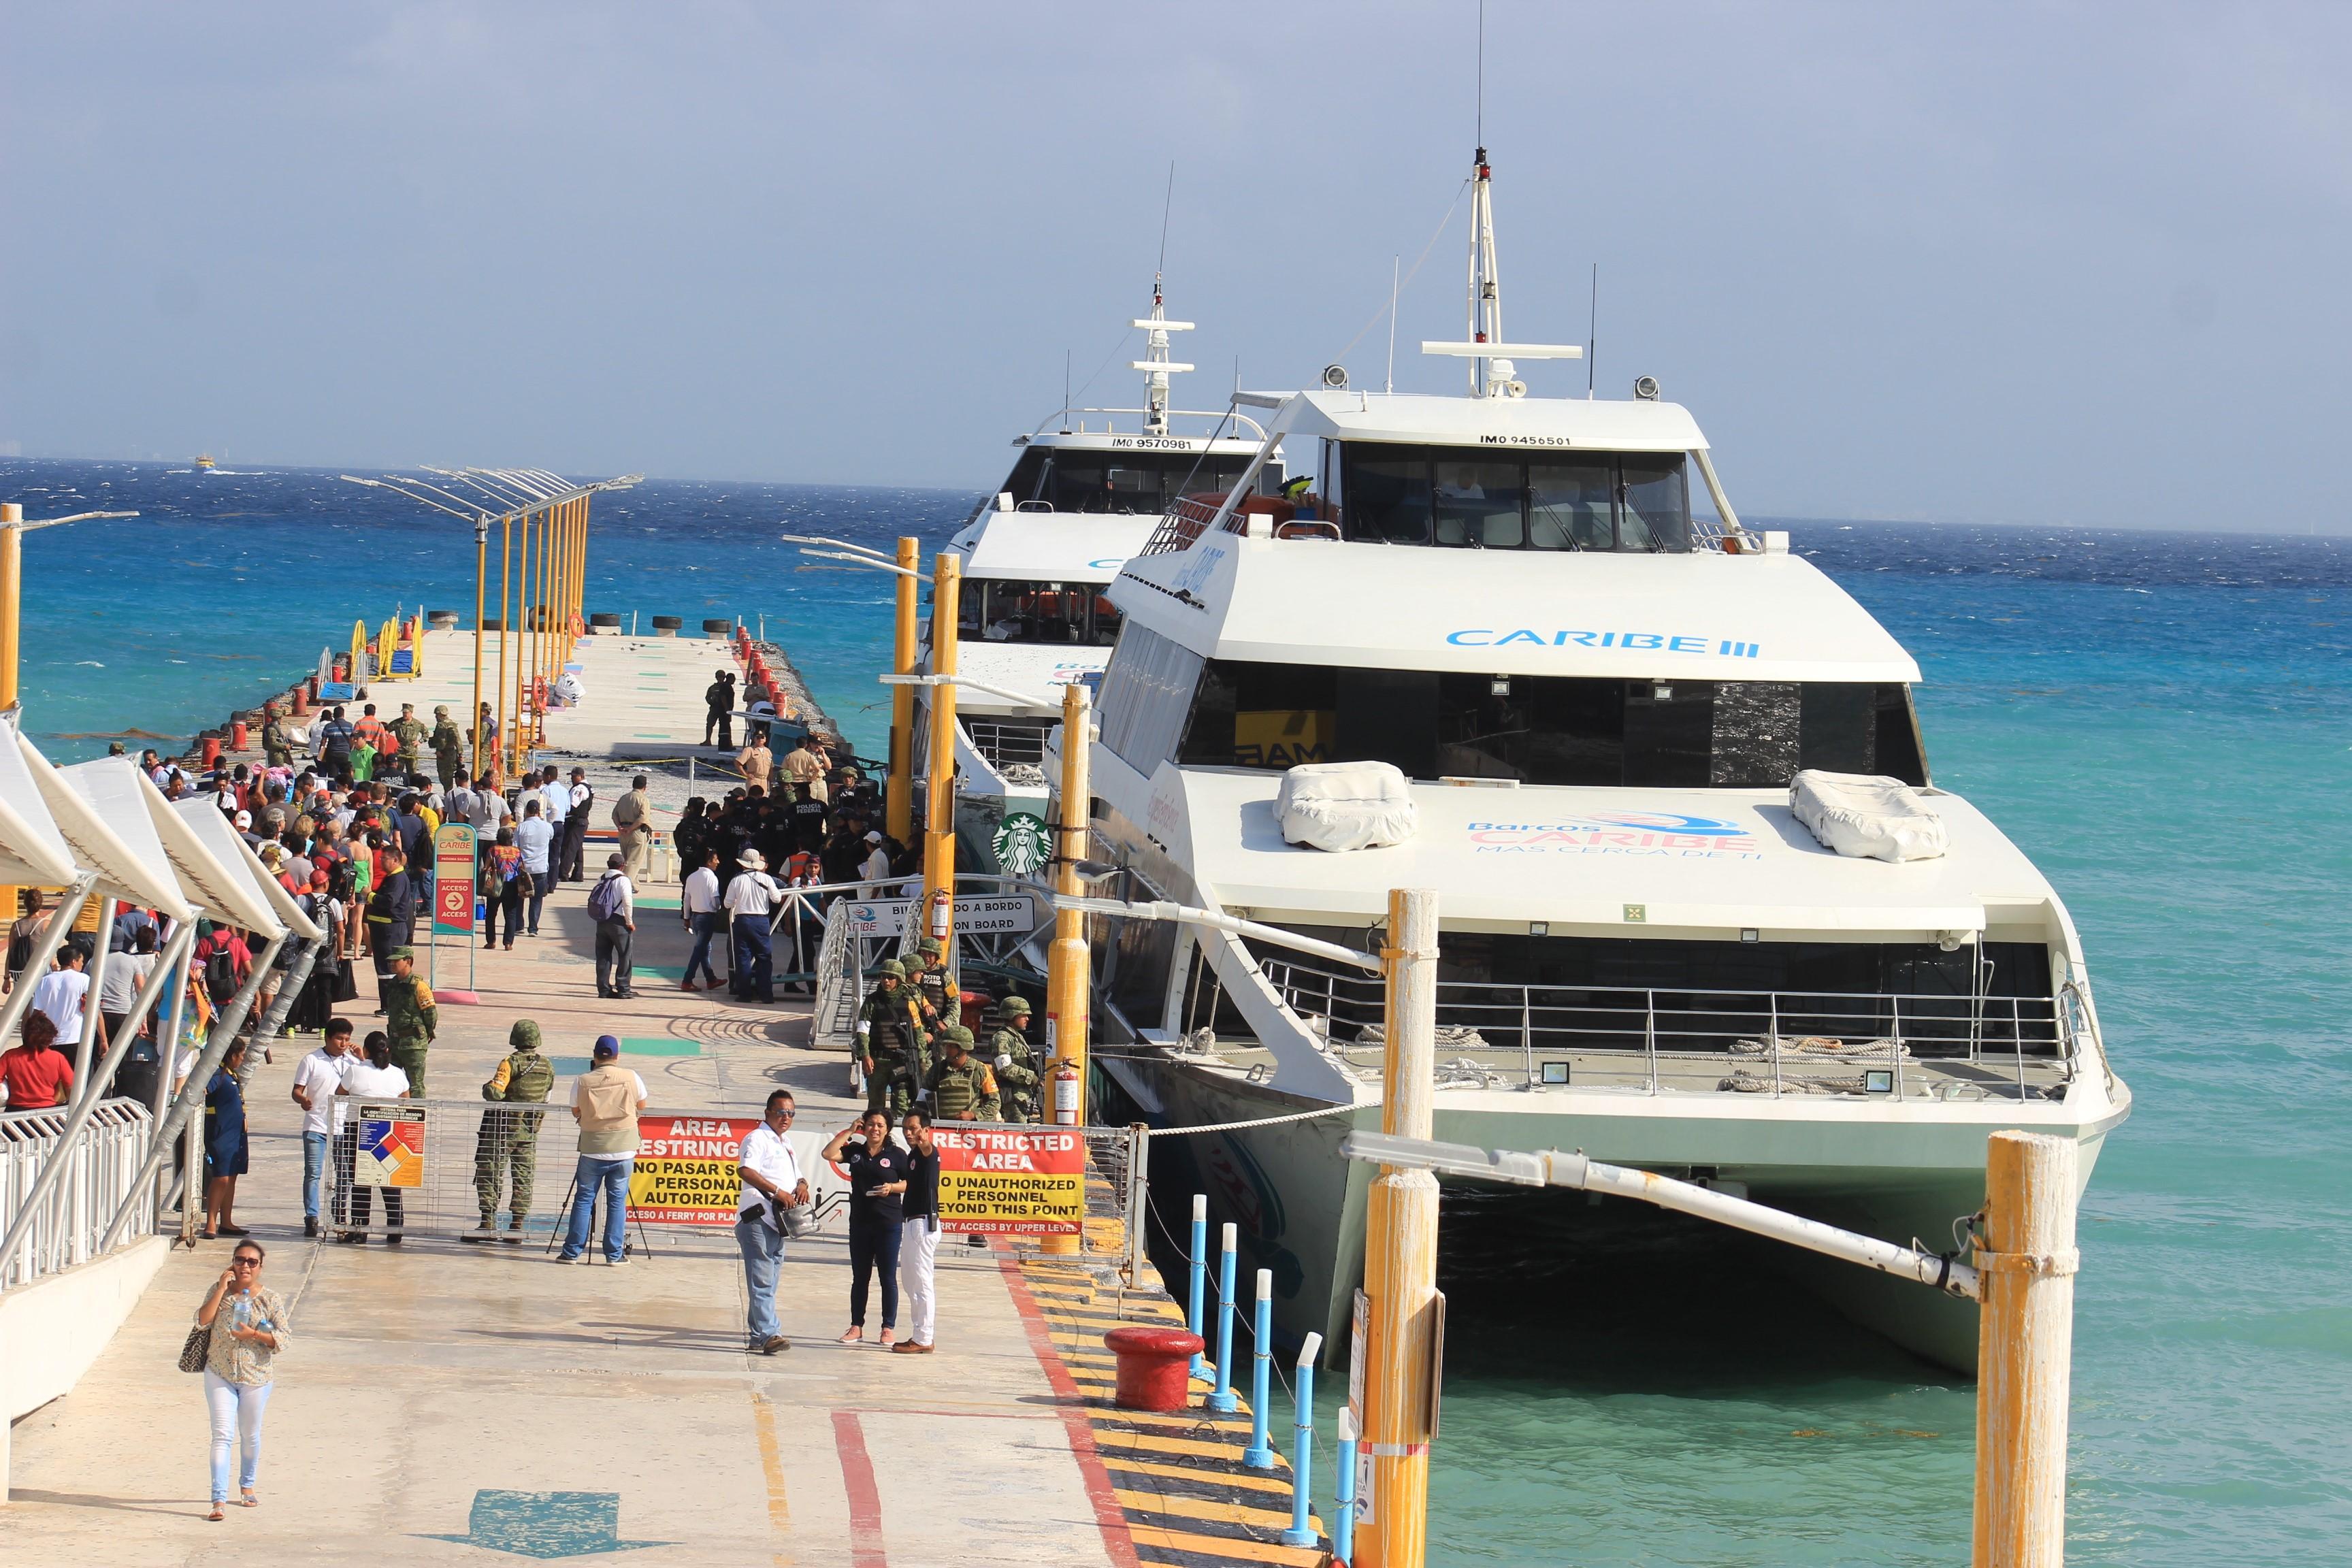 Playa del Carmen: U S  issues travel warning for popular